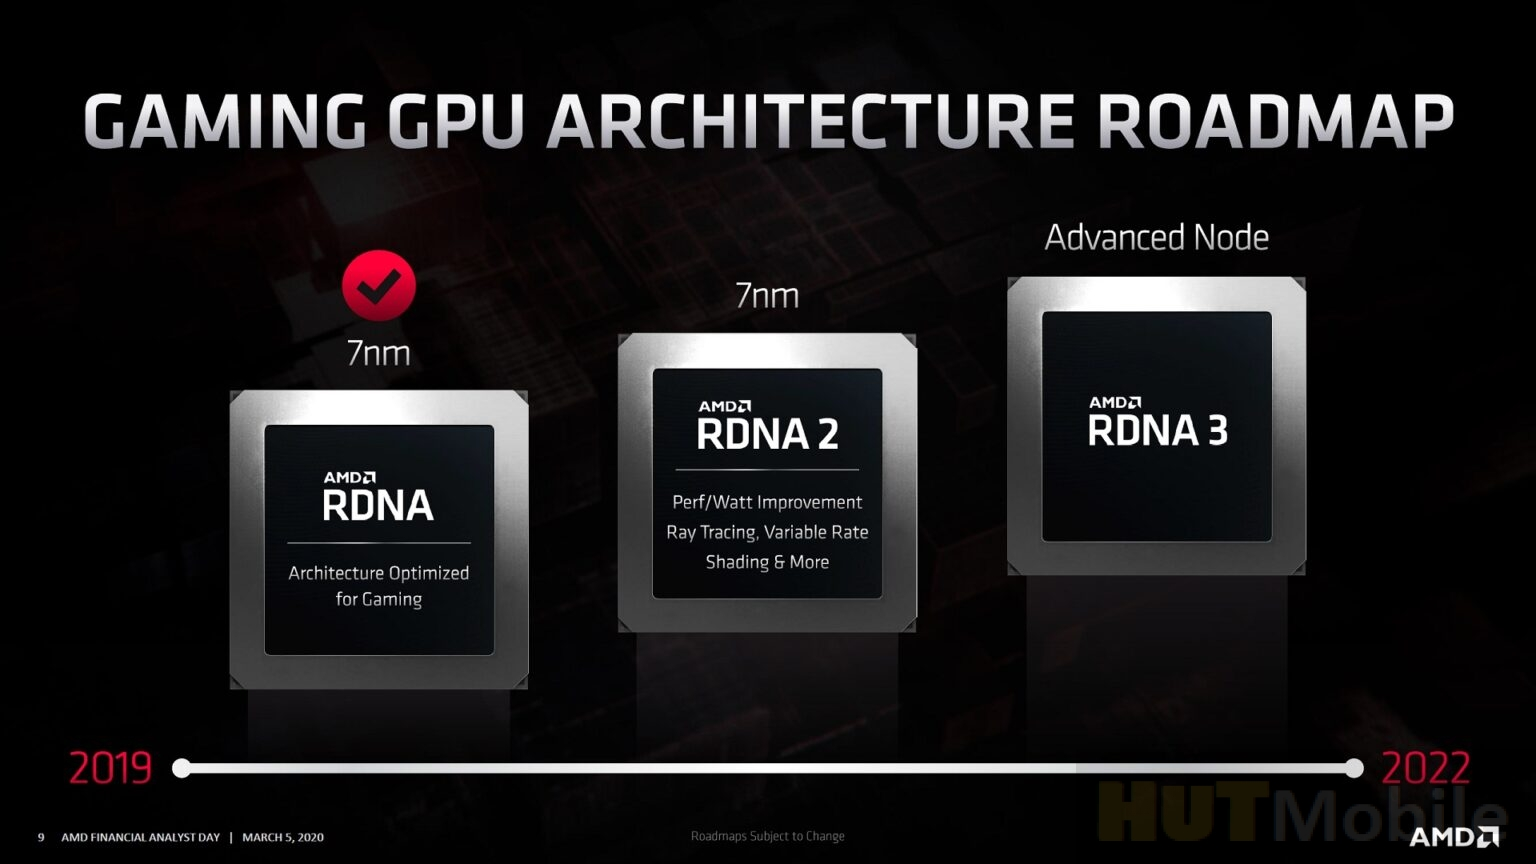 AMD Big Navi graphics card surprises with its VRAM value: NVIDIA killer AMD Big Navi will surprise with its VRAM value